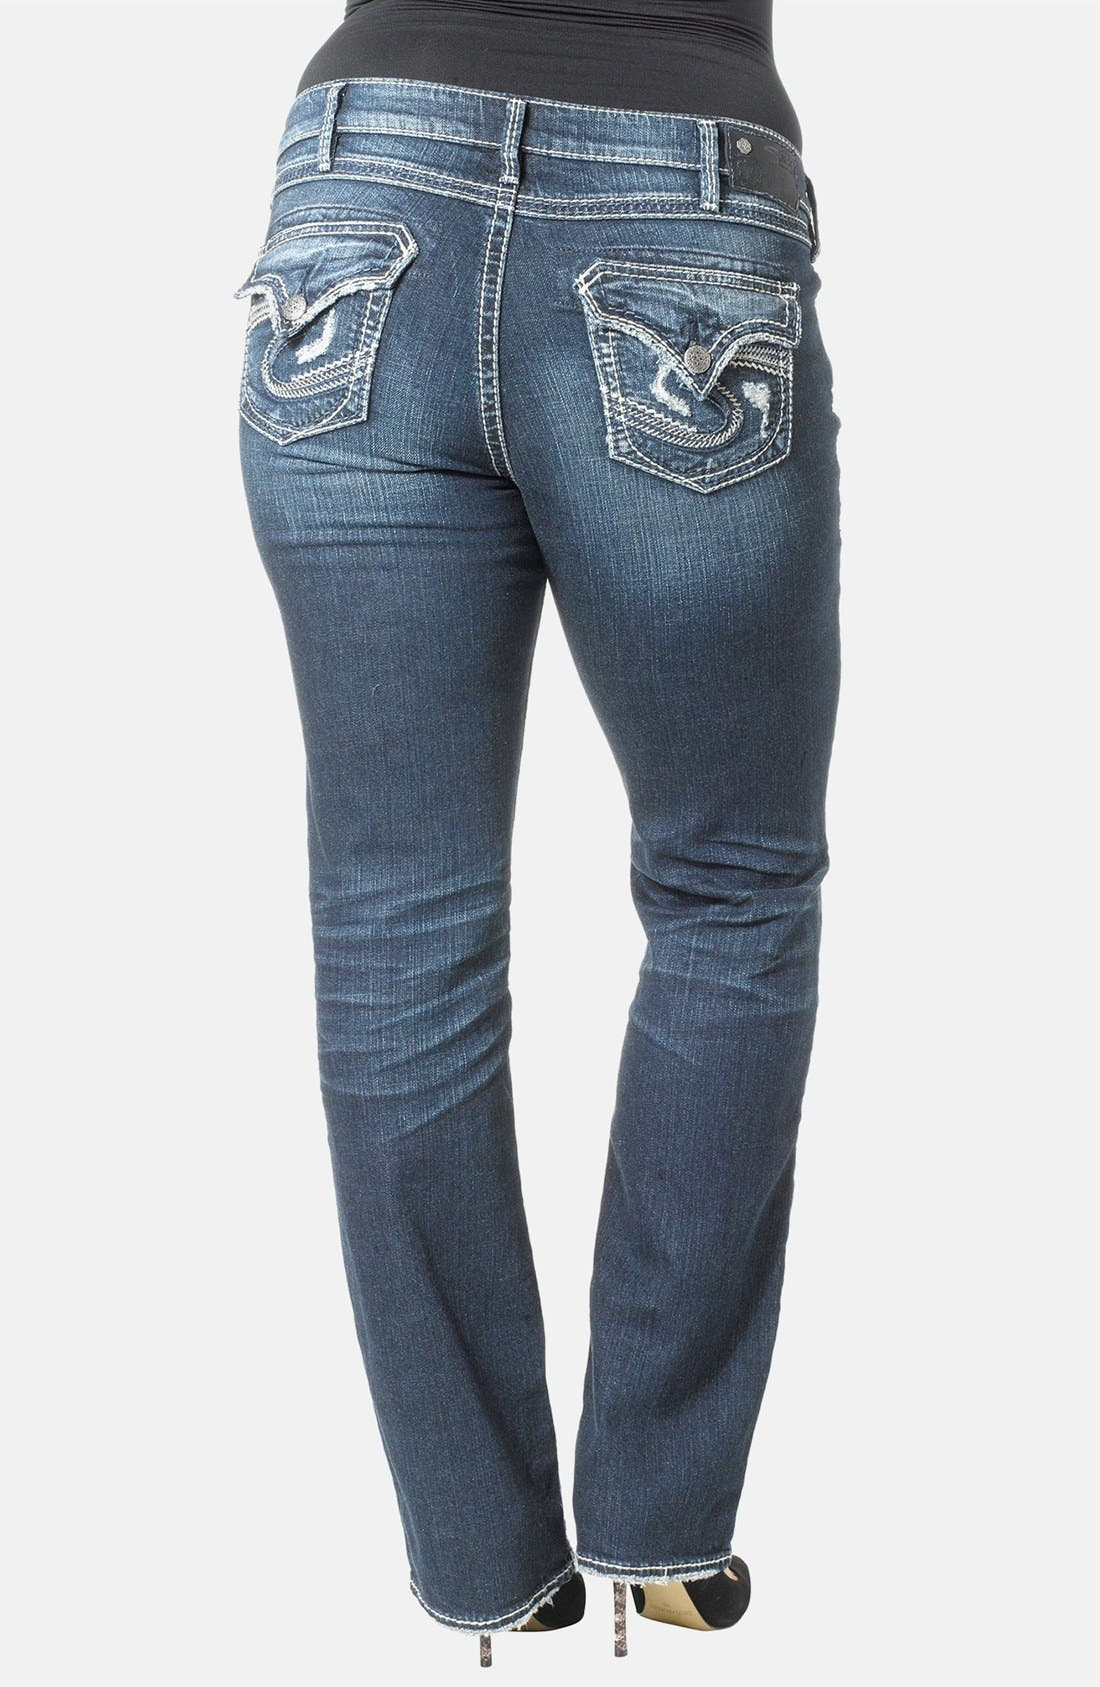 Alternate Image 2  - Silver Jeans Co. 'Aiko' Distressed Flap Pocket Straight Leg Jeans (Plus Size)